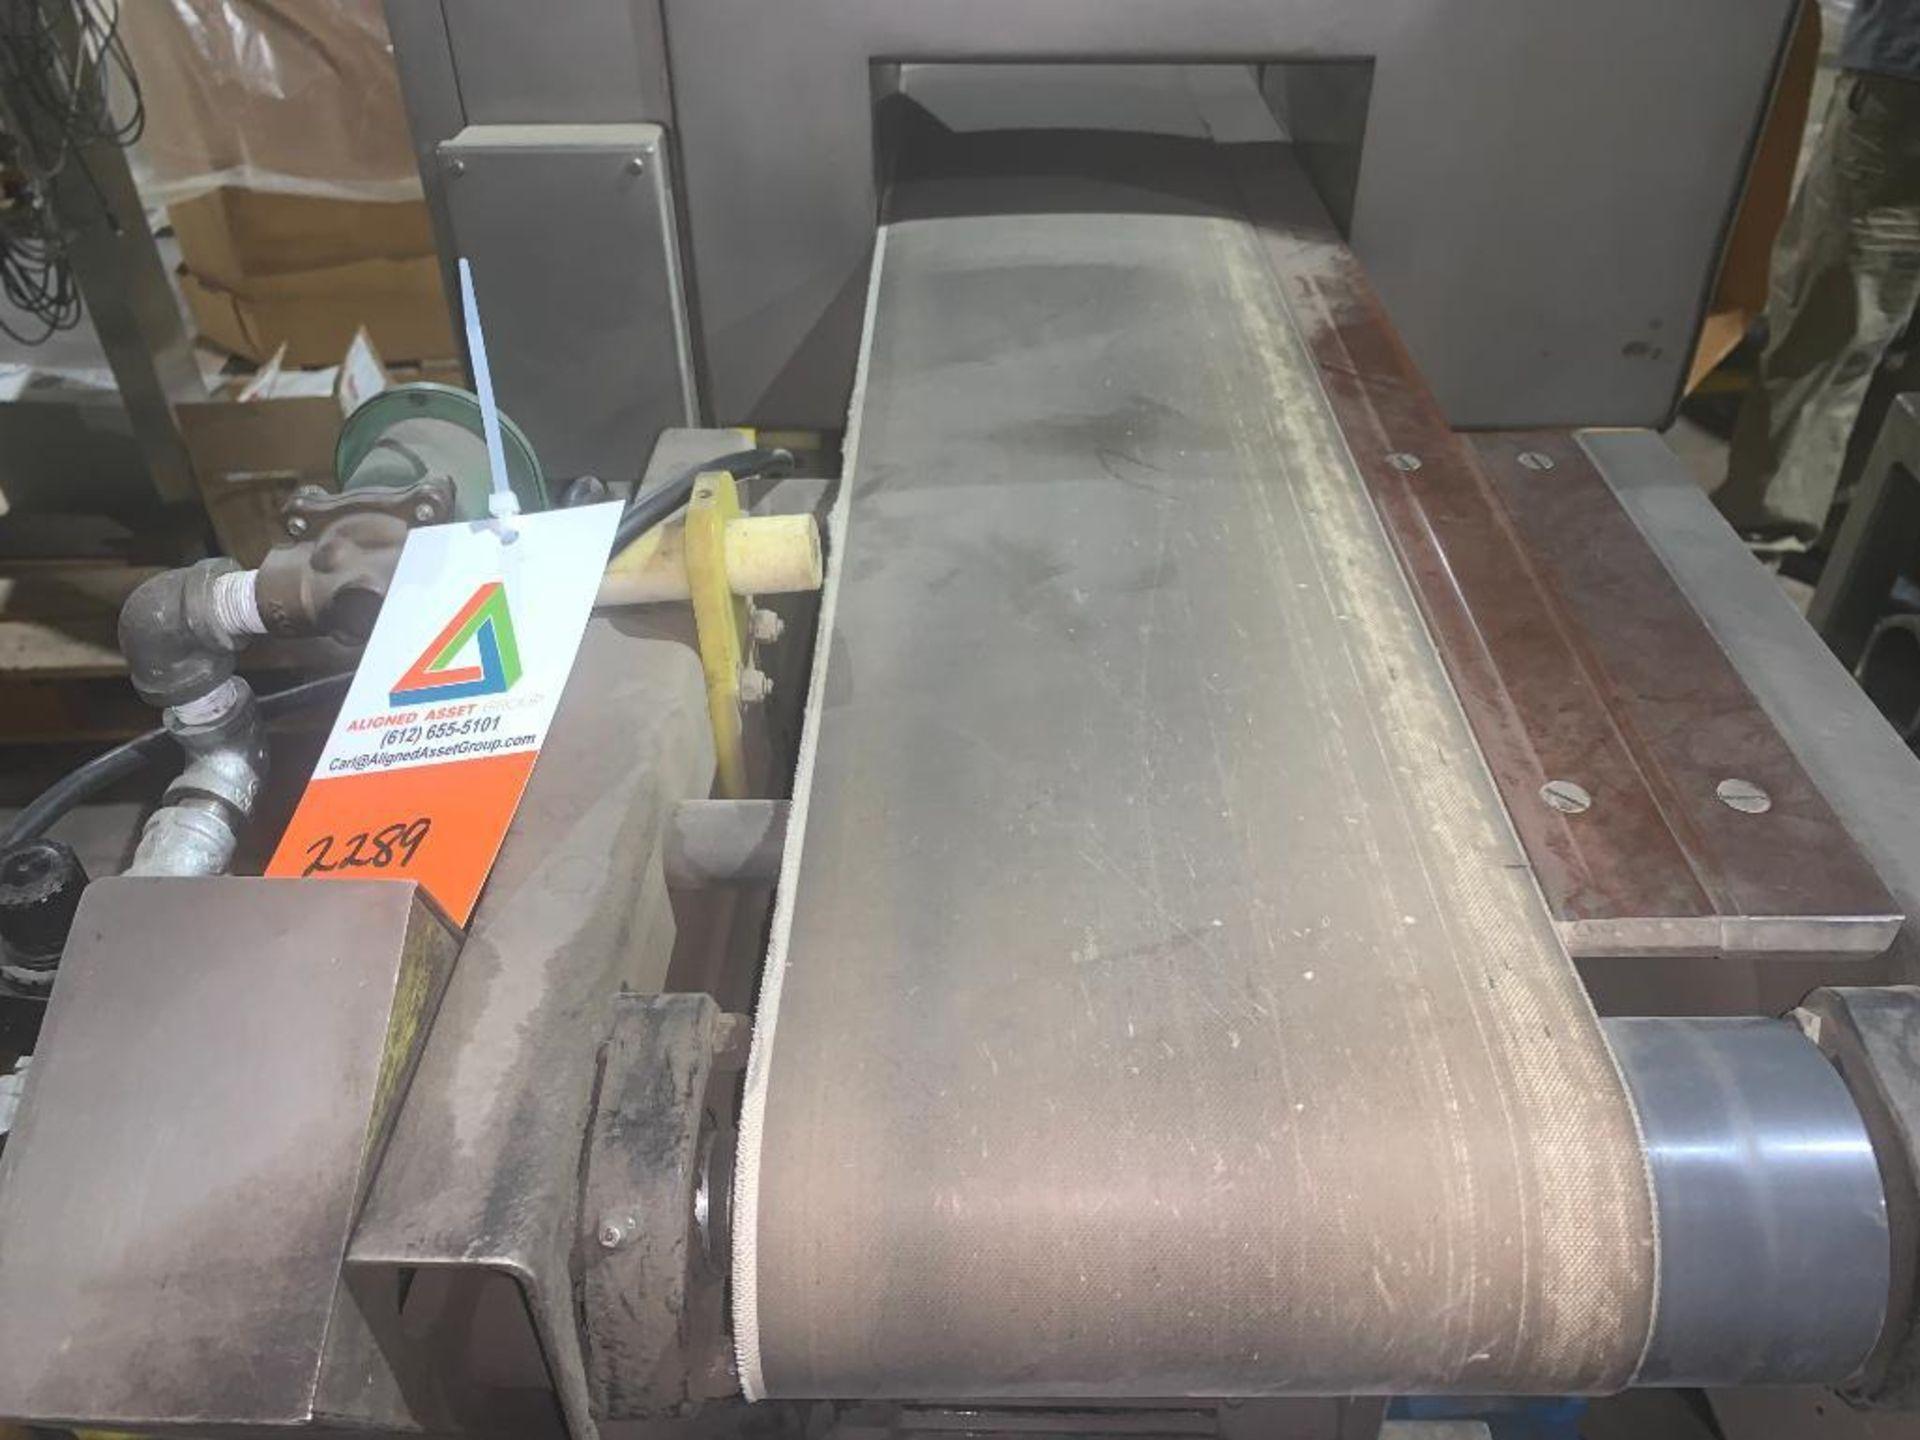 Loma metal detector - Image 5 of 10